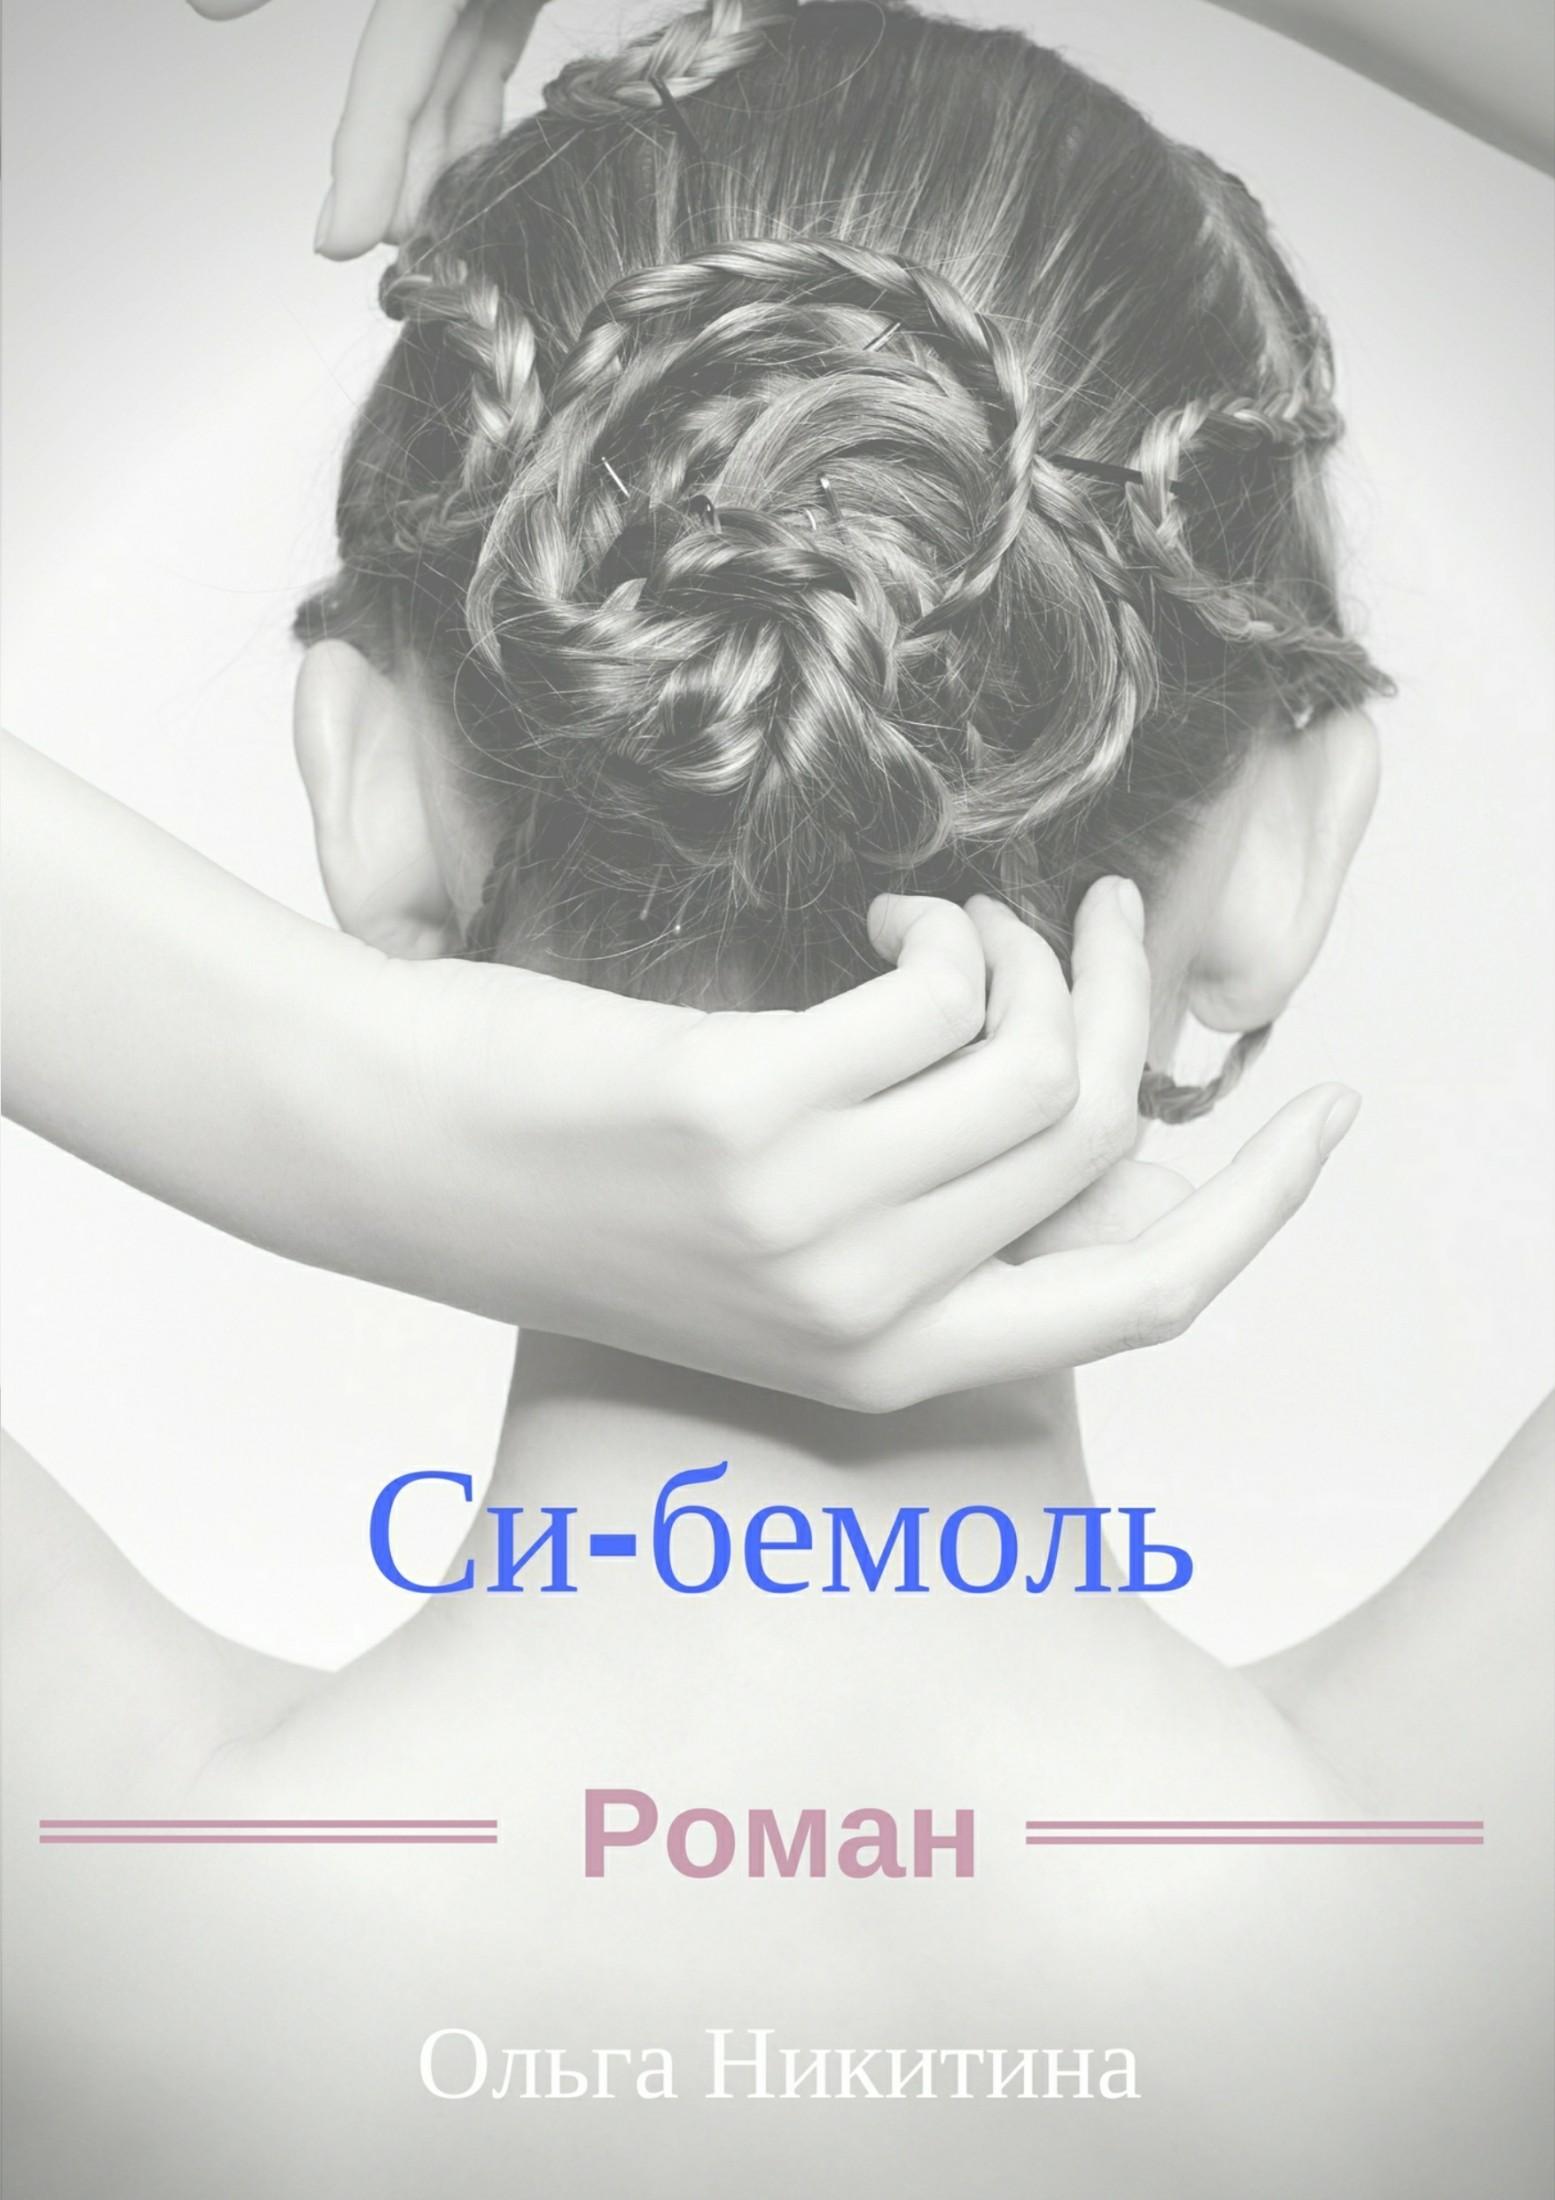 Ольга Юрьевна Никитина Си-бемоль хочу машину б у в москве мультилифт авито ру